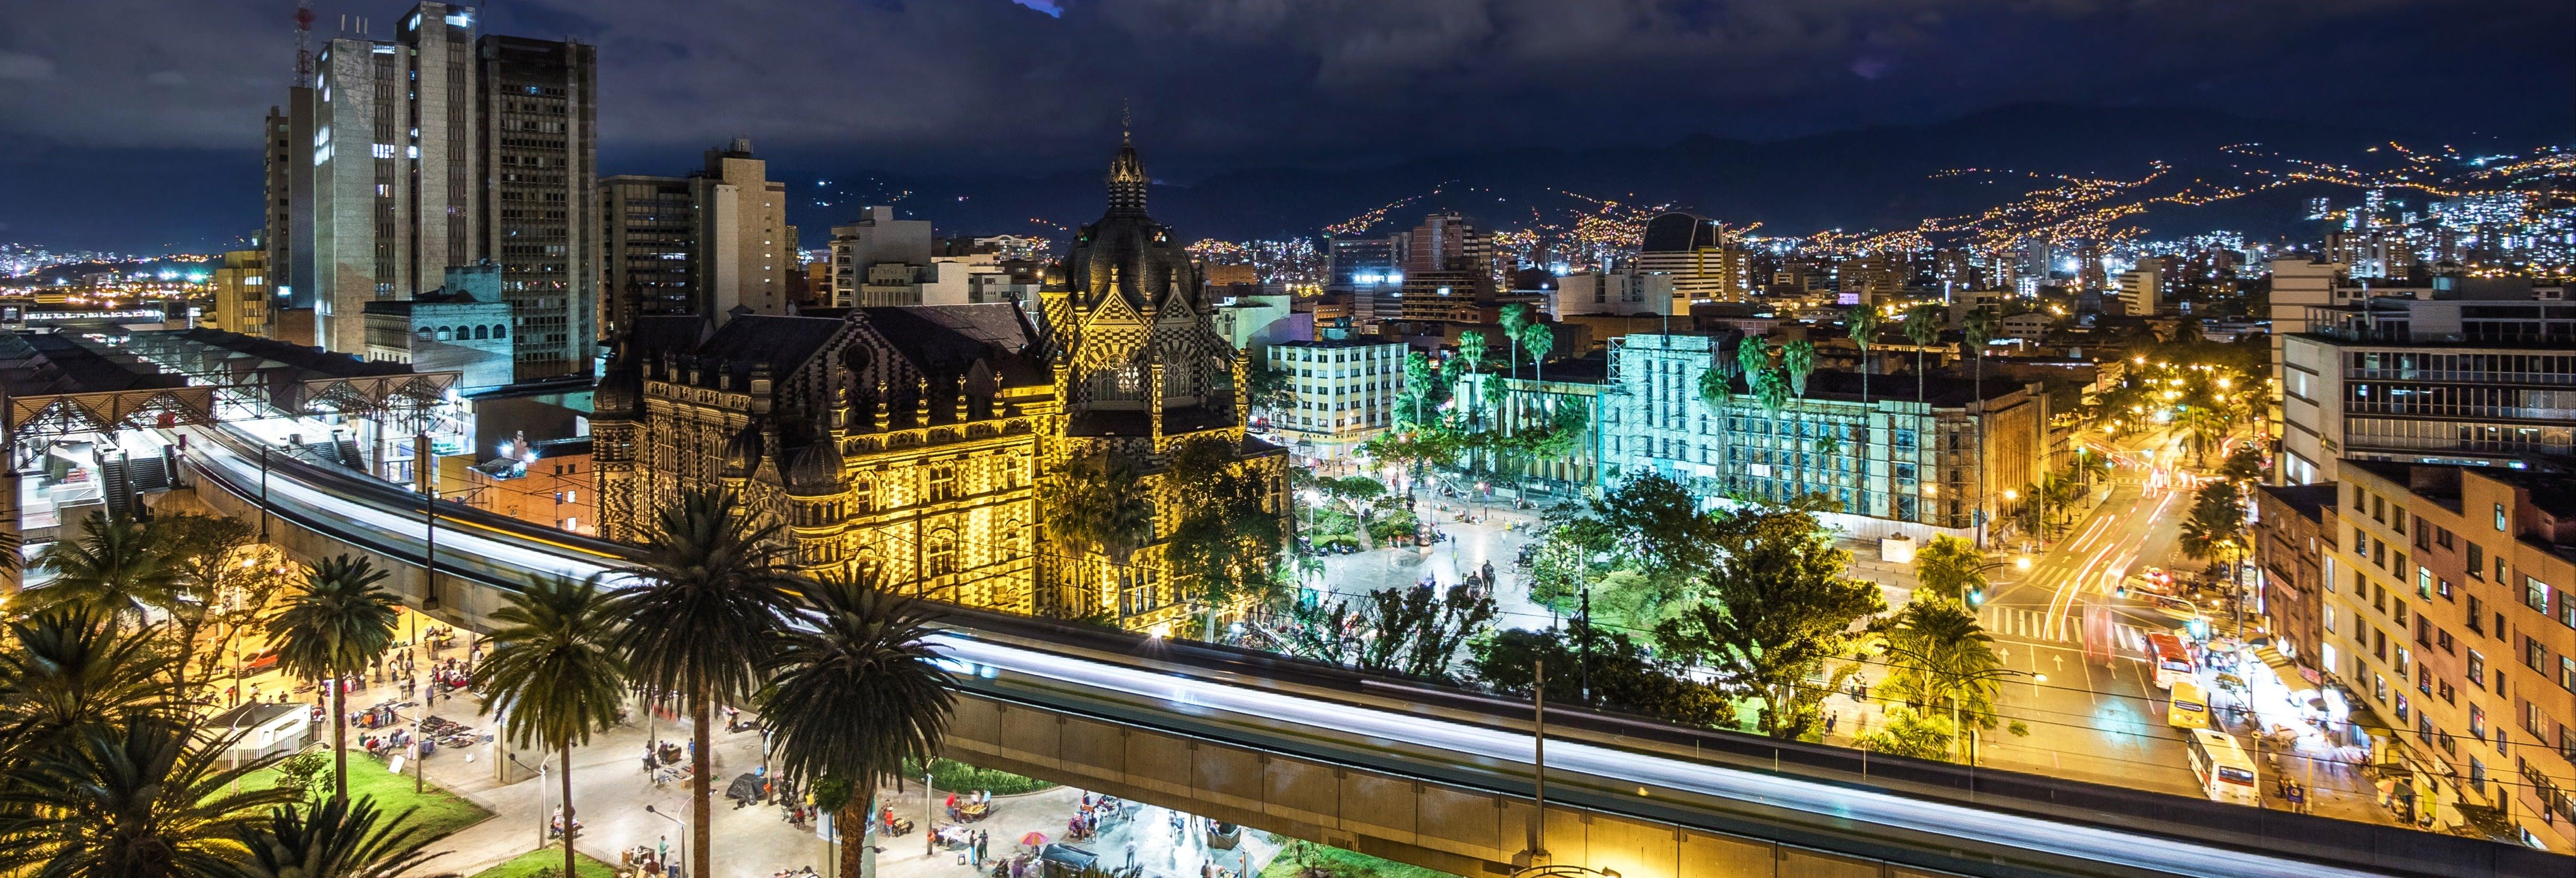 Tour privado nocturno por Medellín